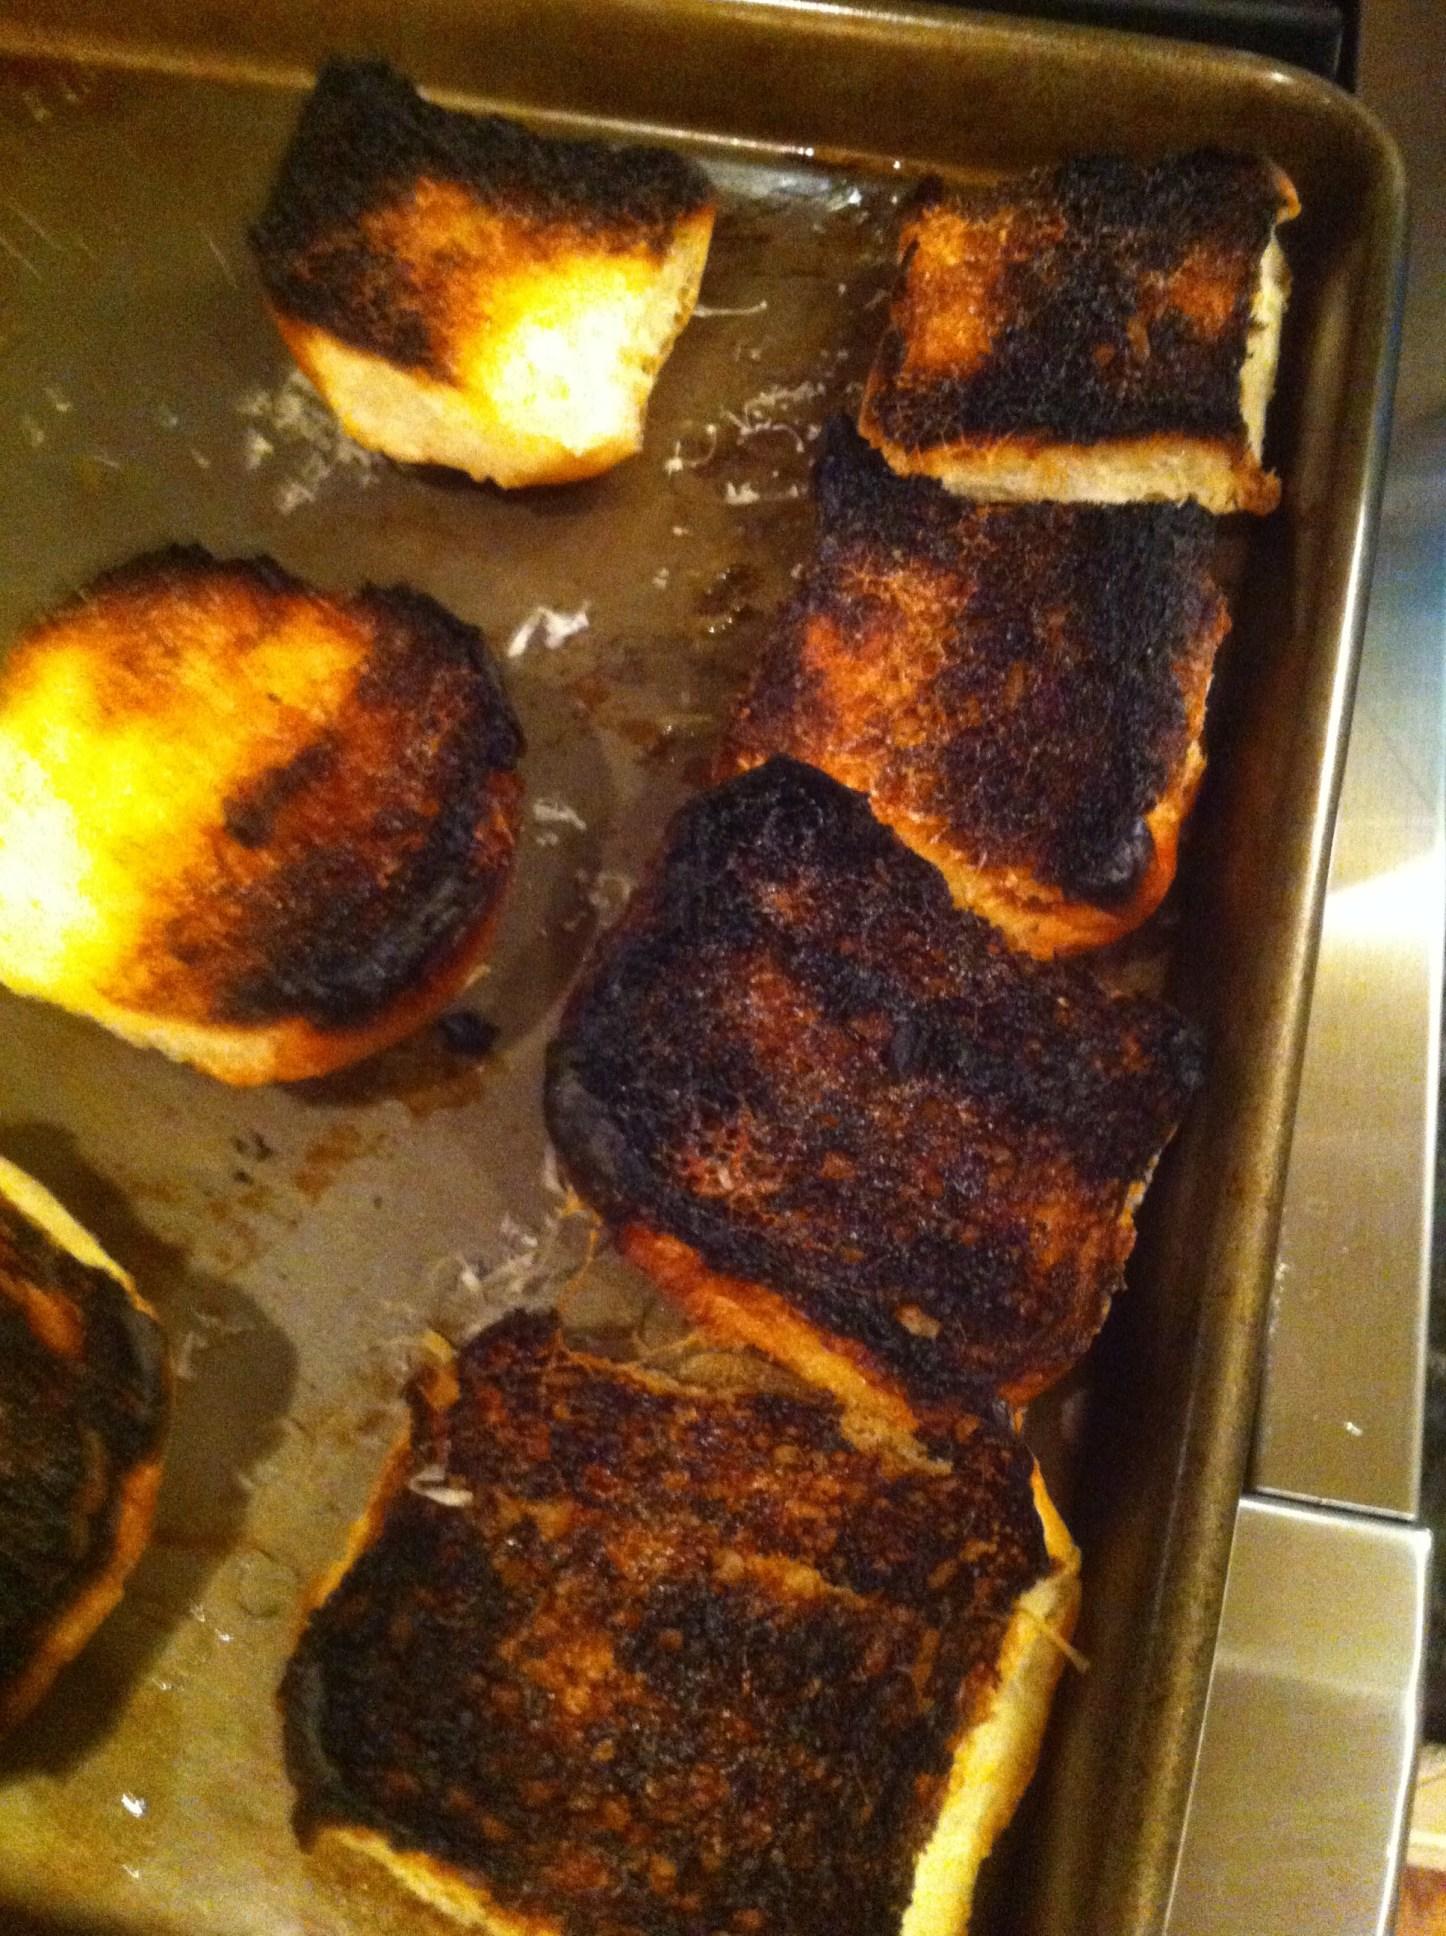 Oh crap! I burned the bread….again!